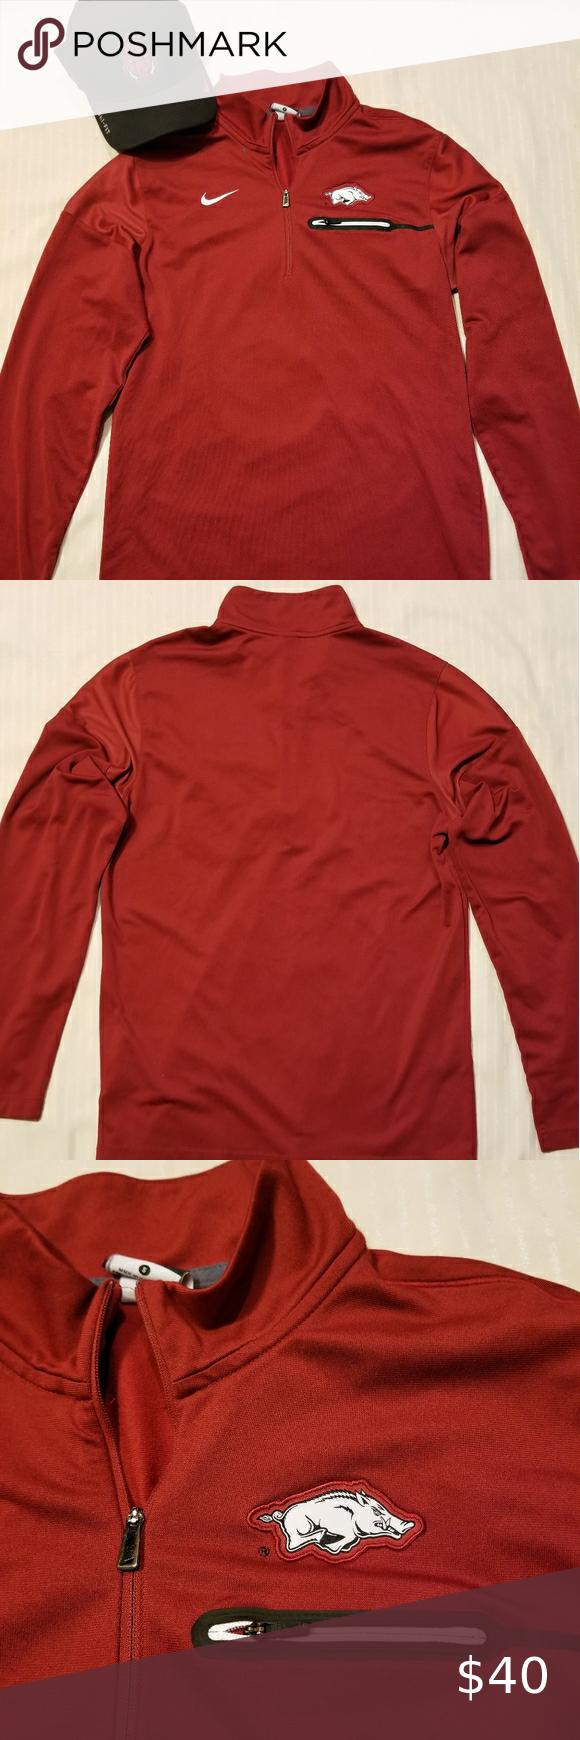 Nike Arkansas Razorbacks Classic 99 Hat Euc Sweatshirt Shirt Nike Shirts Sweatshirts Hoodie [ 1740 x 580 Pixel ]